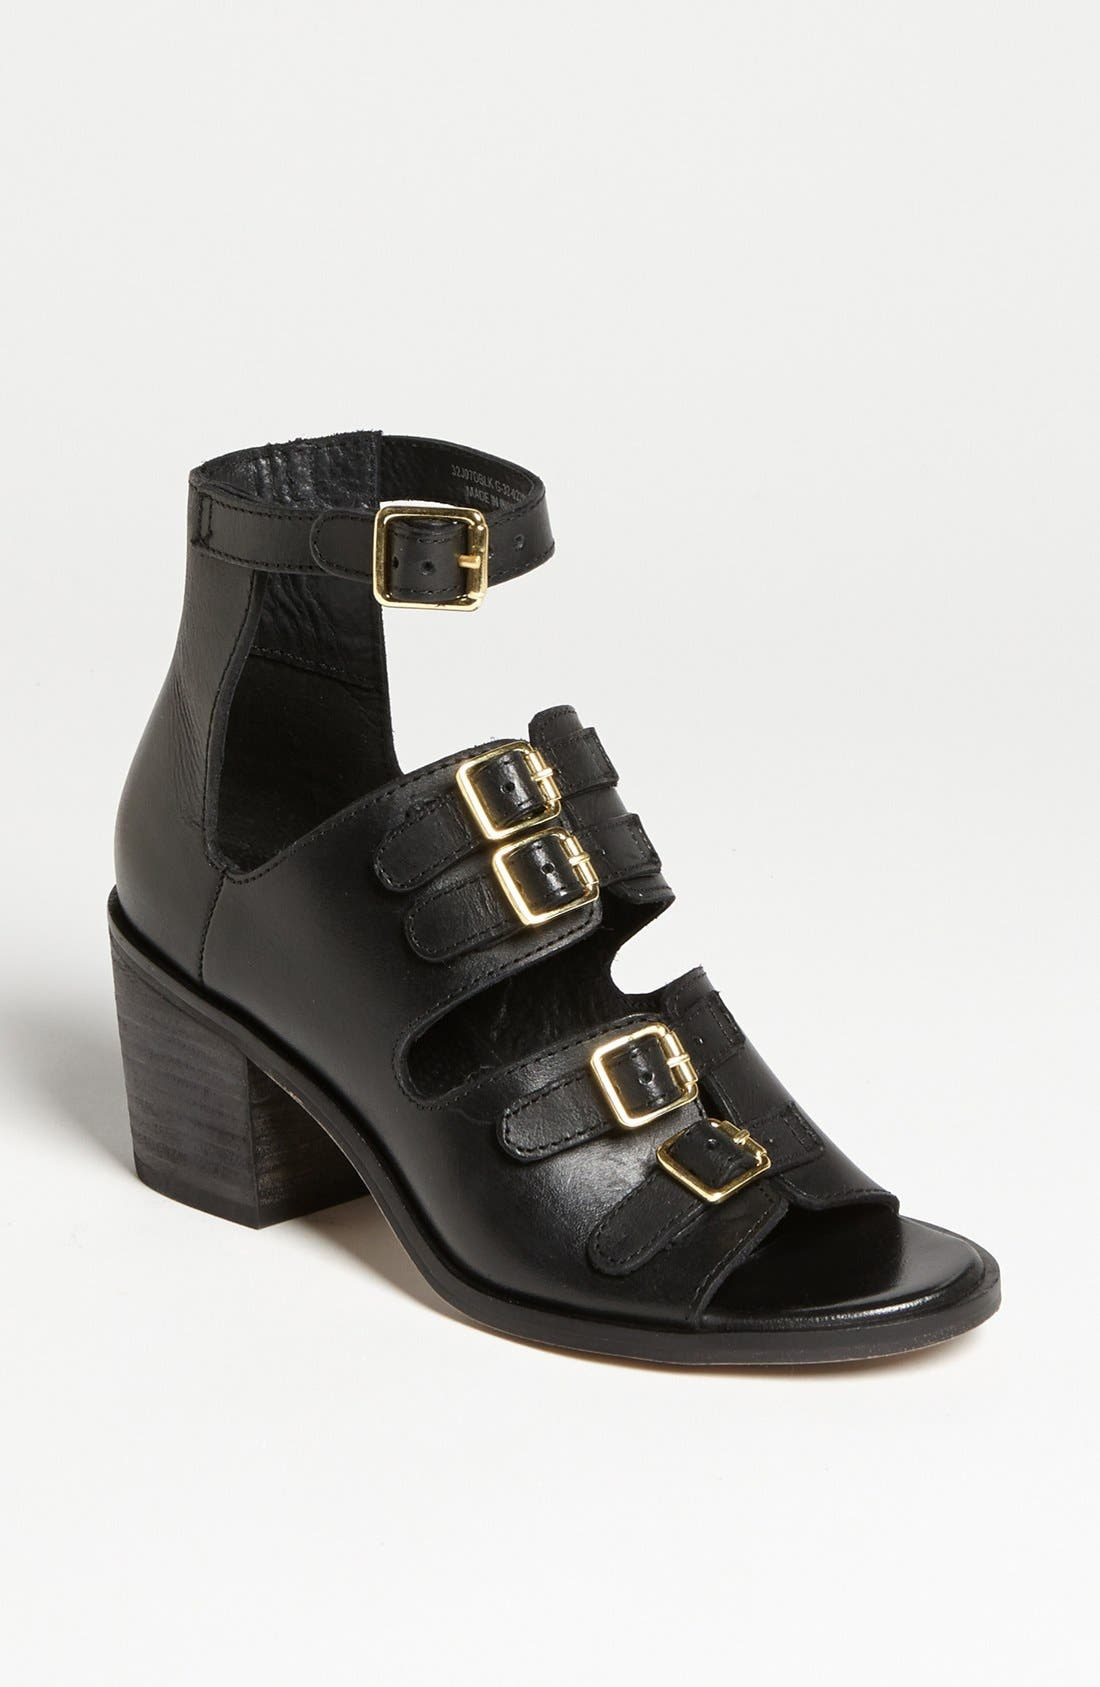 Alternate Image 1 Selected - Topshop 'Jargon' Sandal